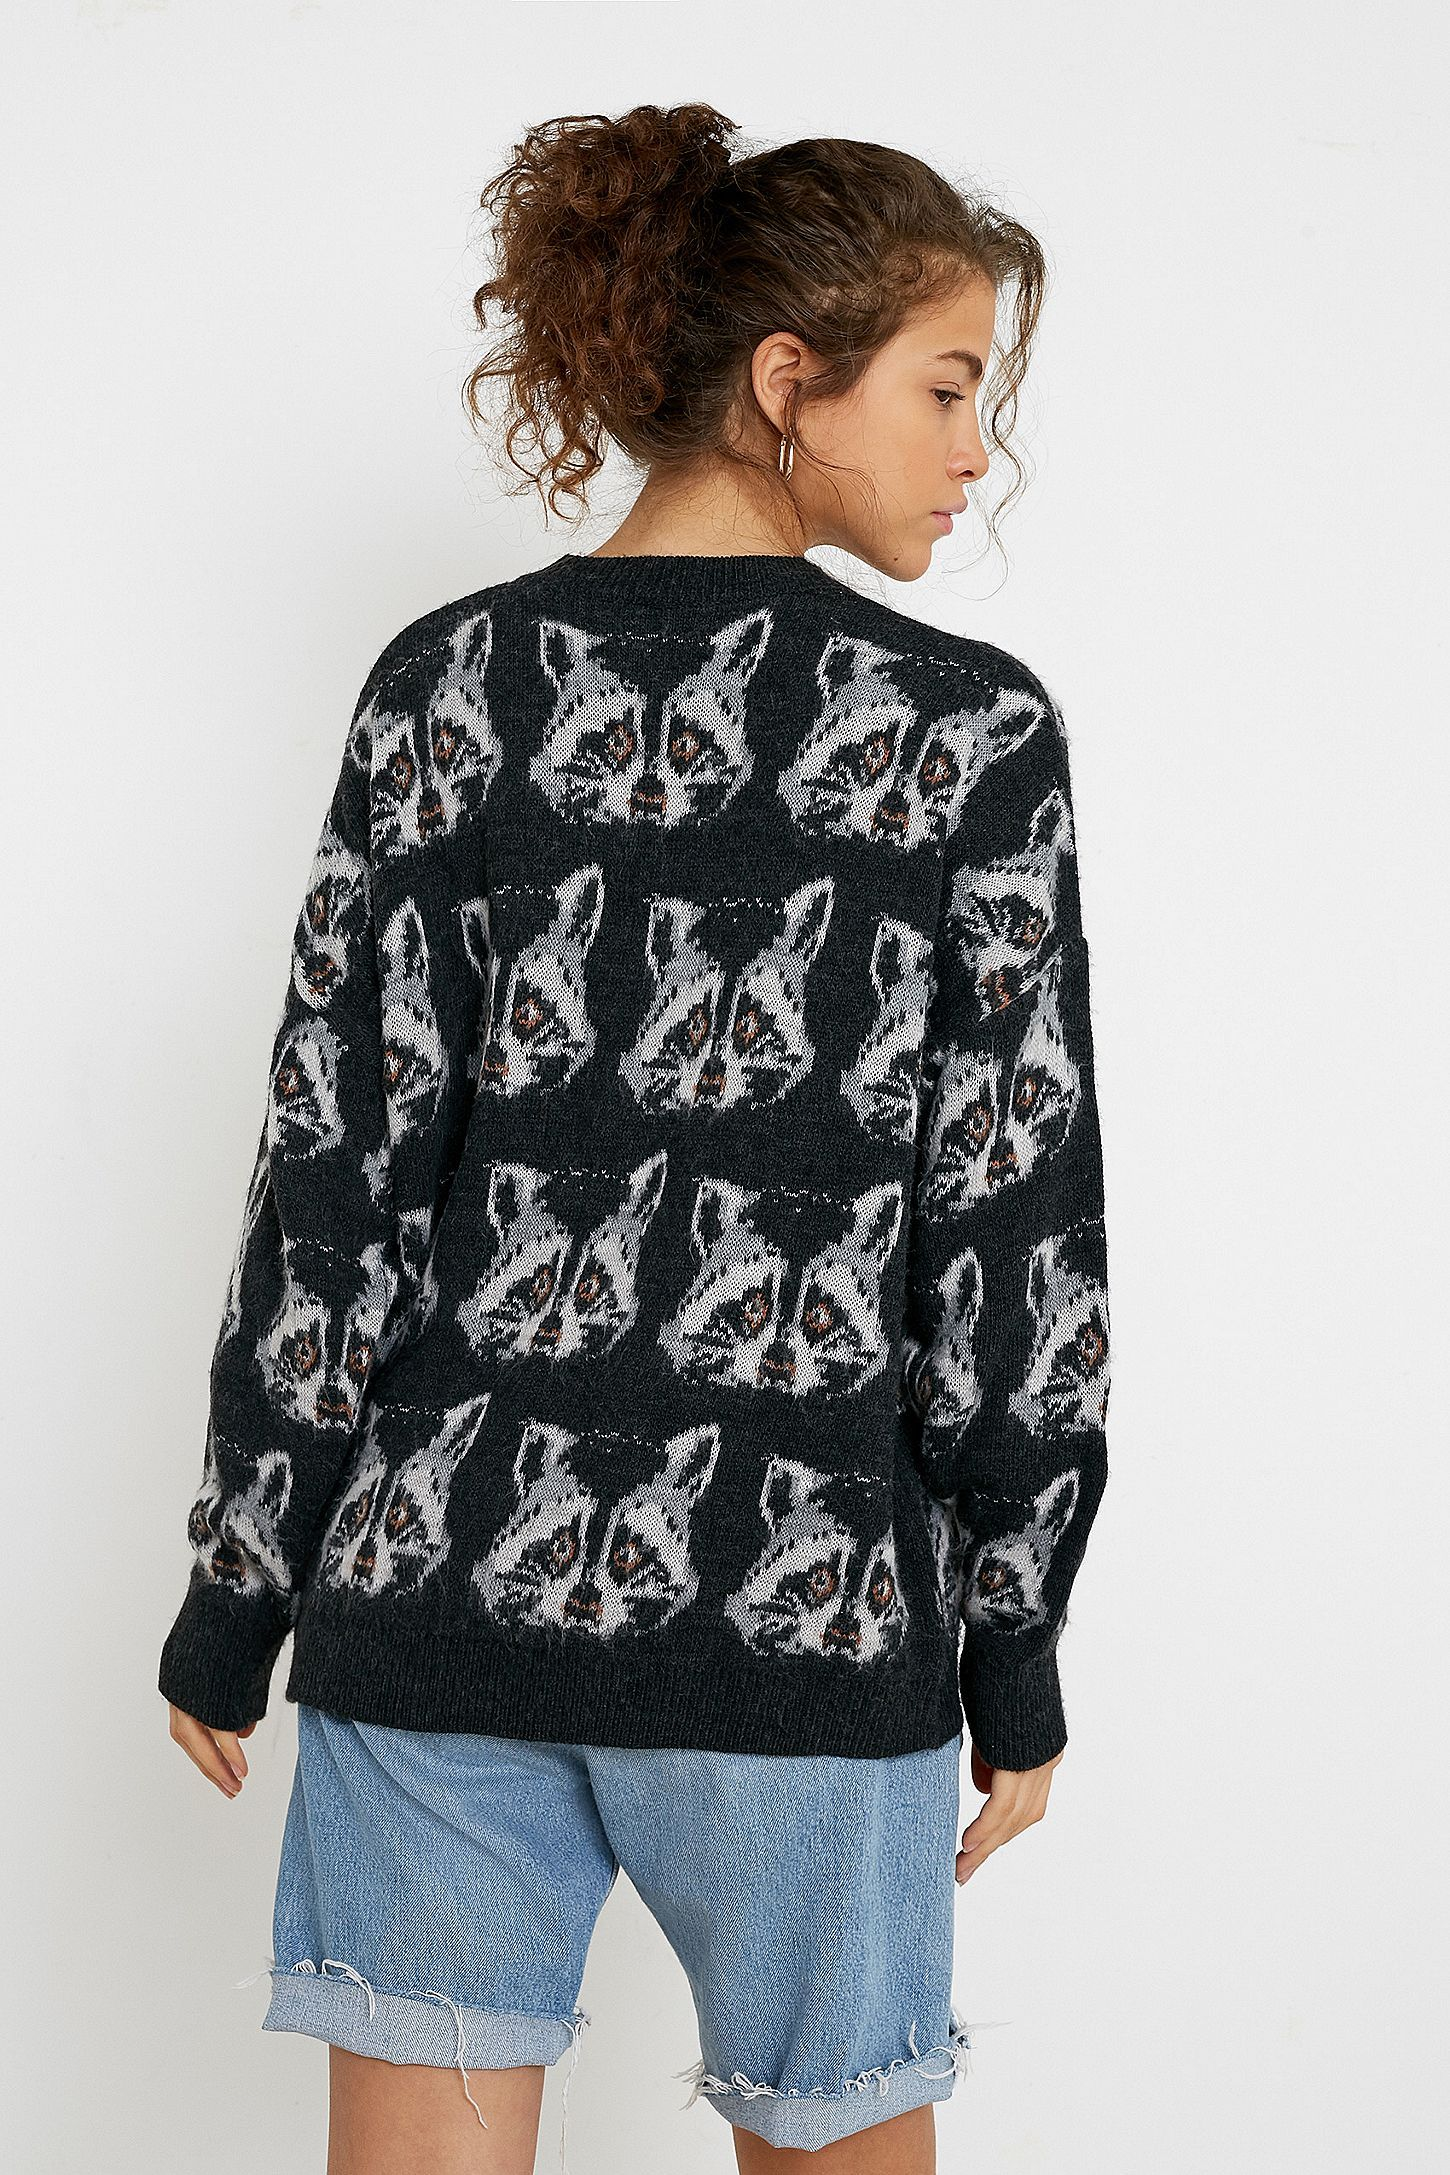 UO Raccoon Jumper   Clothes in 2019   Jumper, Urban